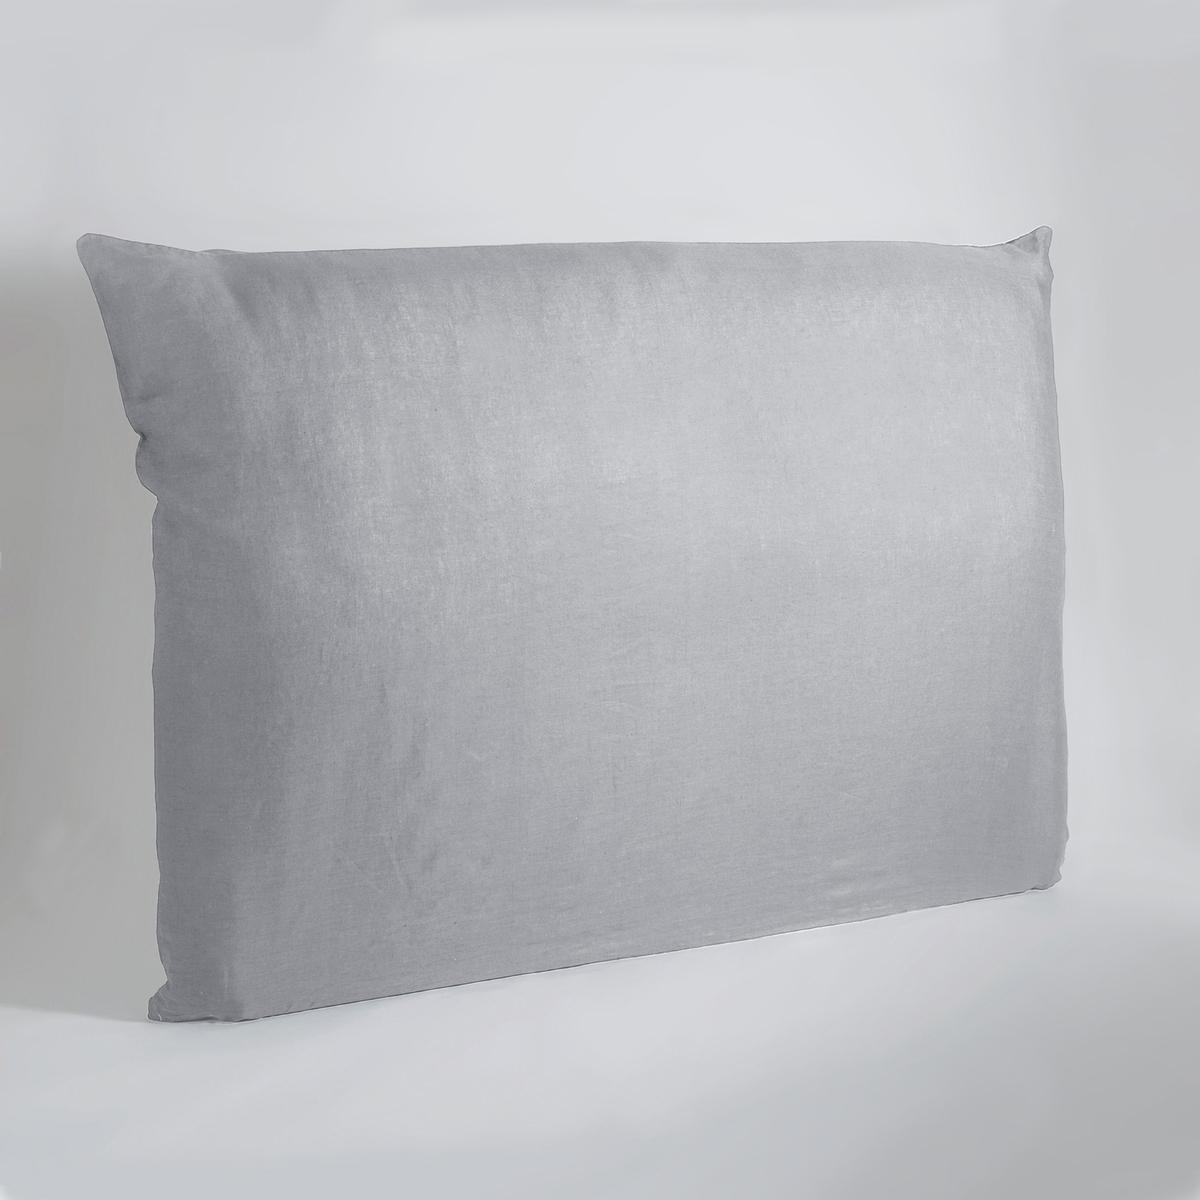 Чехол LaRedoute На изголовье кровати из осветленного льна Mereson 160 см серый